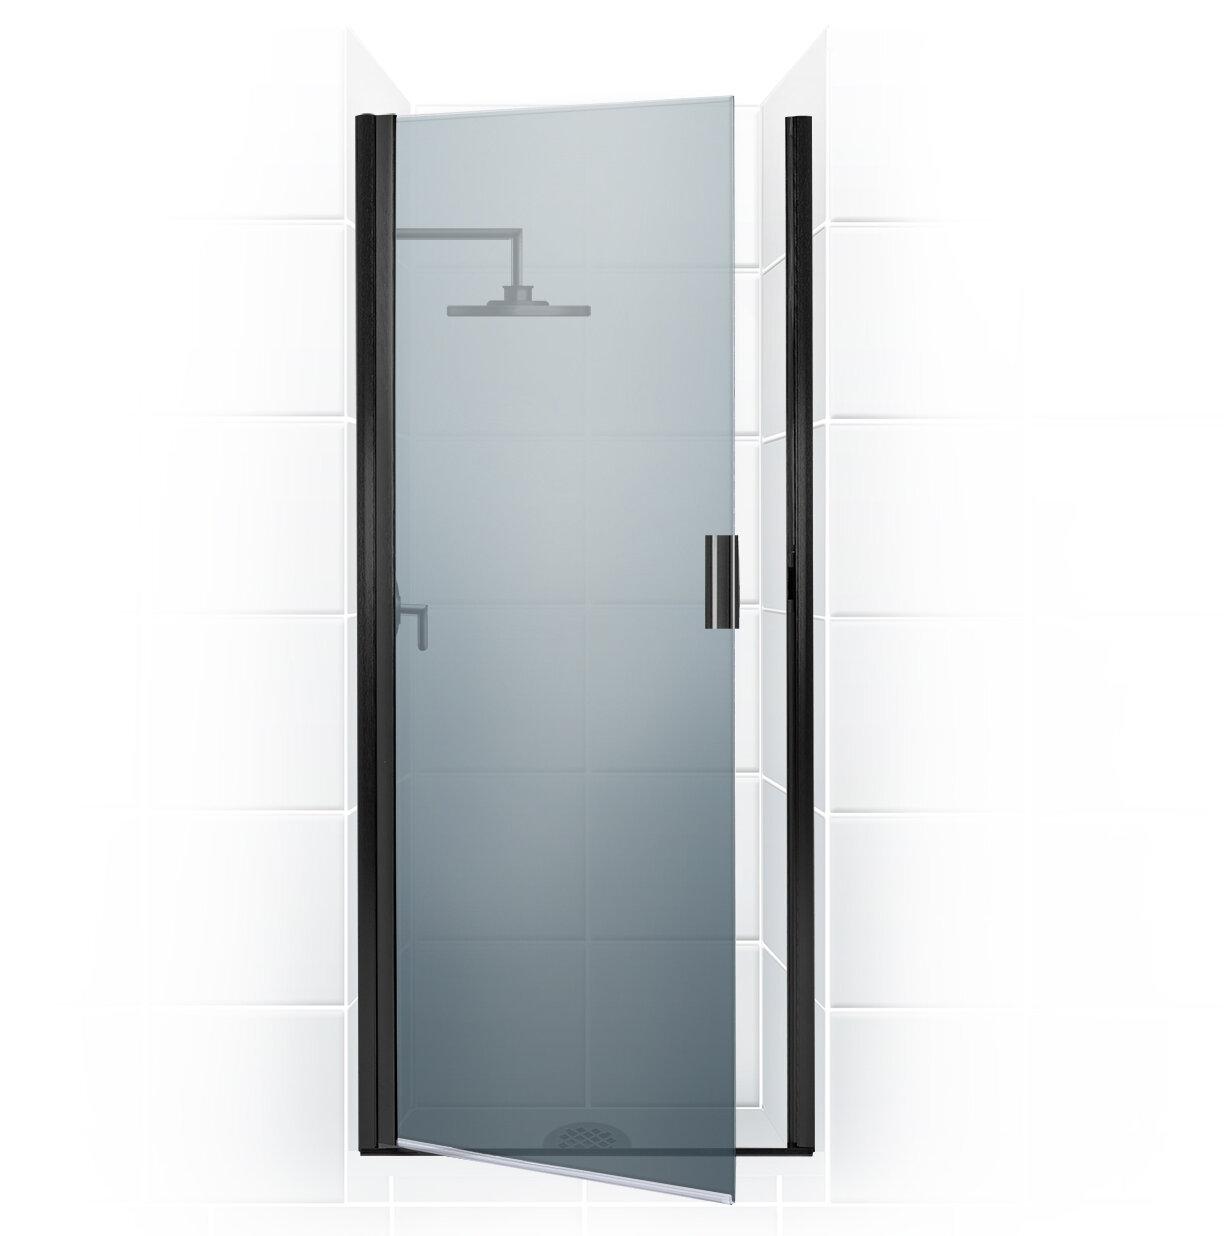 Paragon Series 25 X 69 Hinged Semi Frameless Shower Door